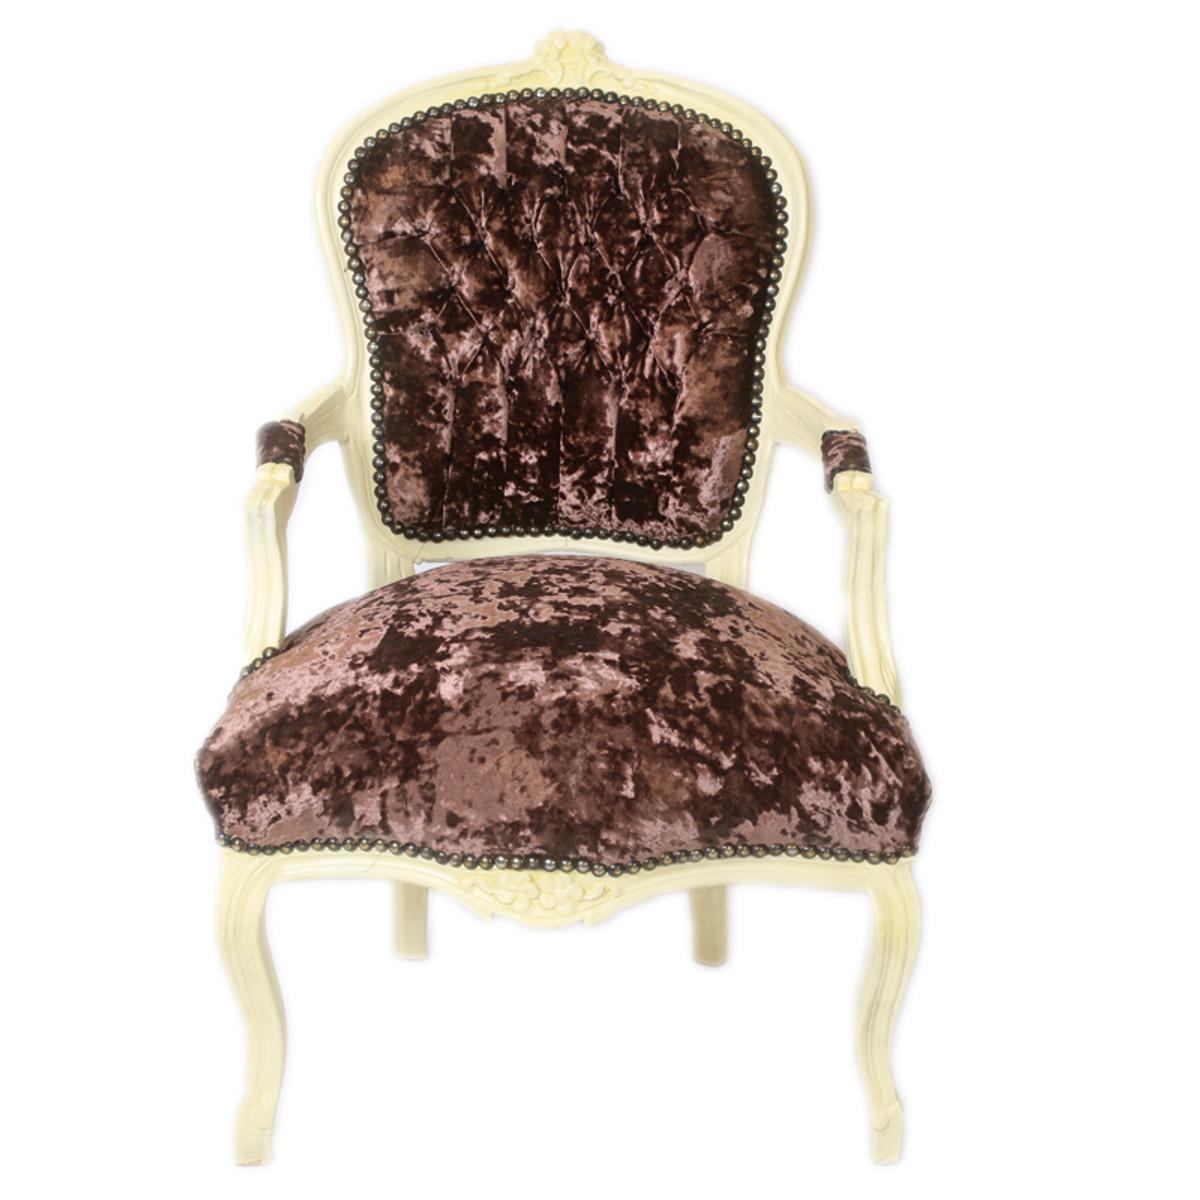 casa padrino barock salon stuhl braun velour stoff creme antik design m bel st hle barock. Black Bedroom Furniture Sets. Home Design Ideas